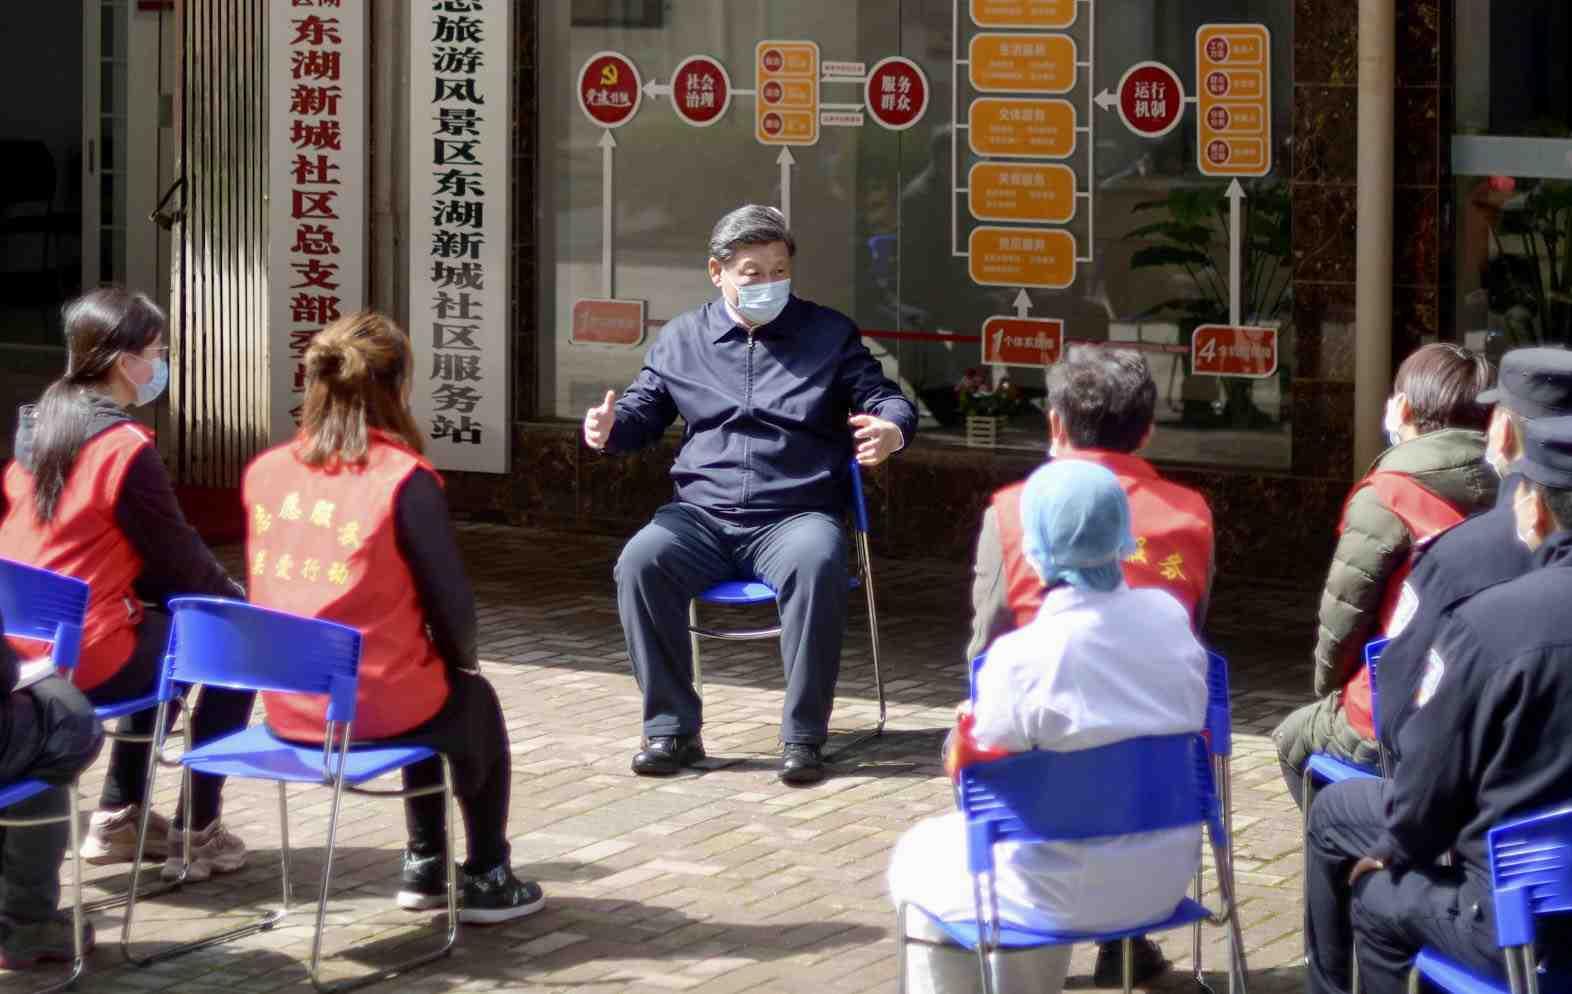 China Xi Jinping and Coronavirus 010